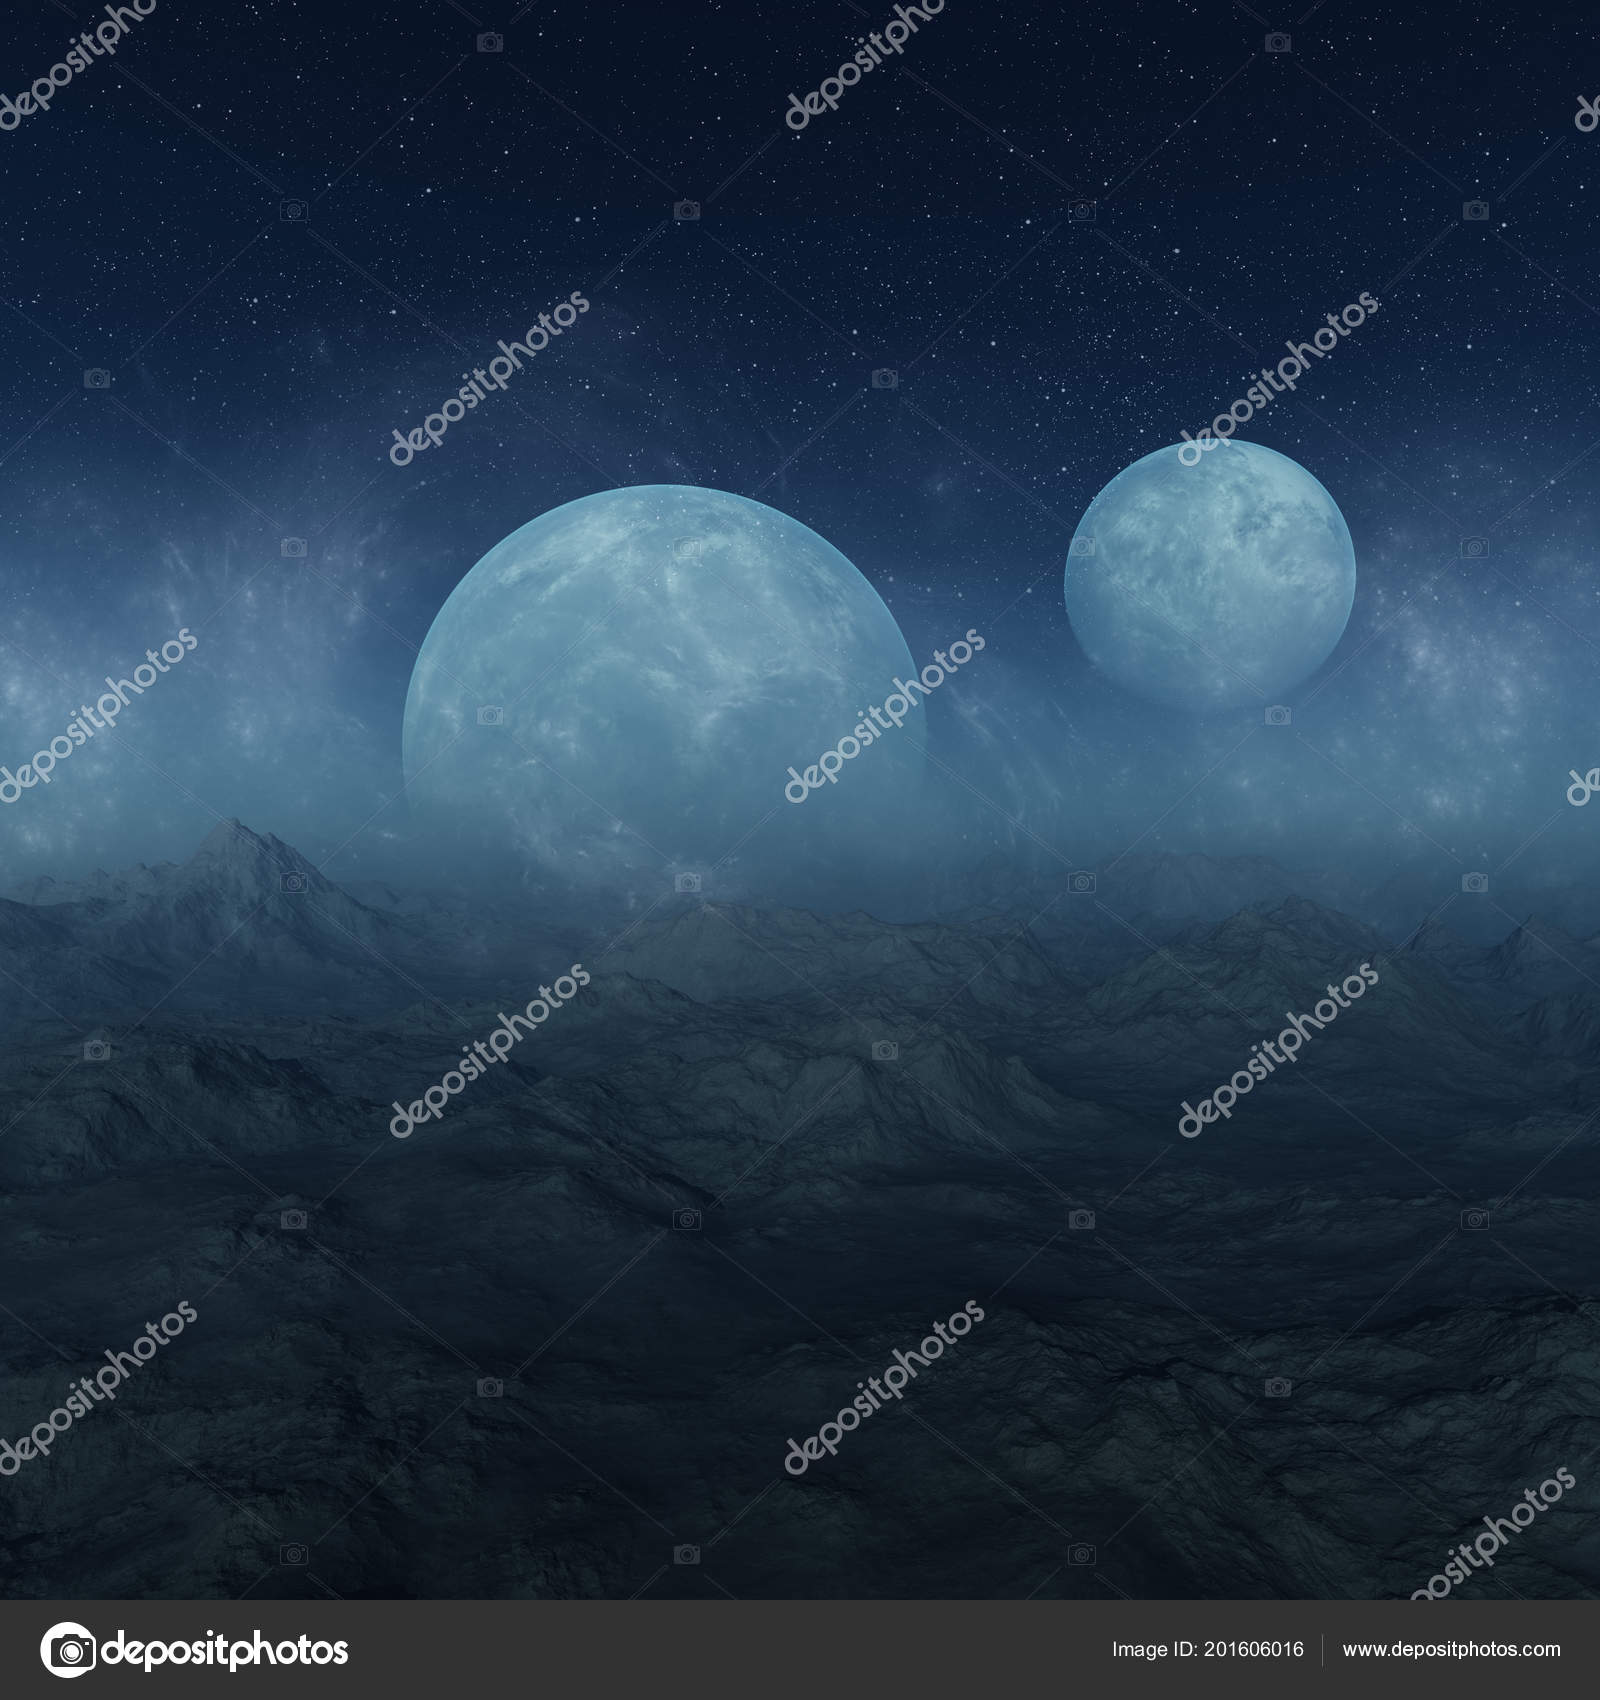 Wallpapers Alien Planet Rendered Space Art Misty Alien